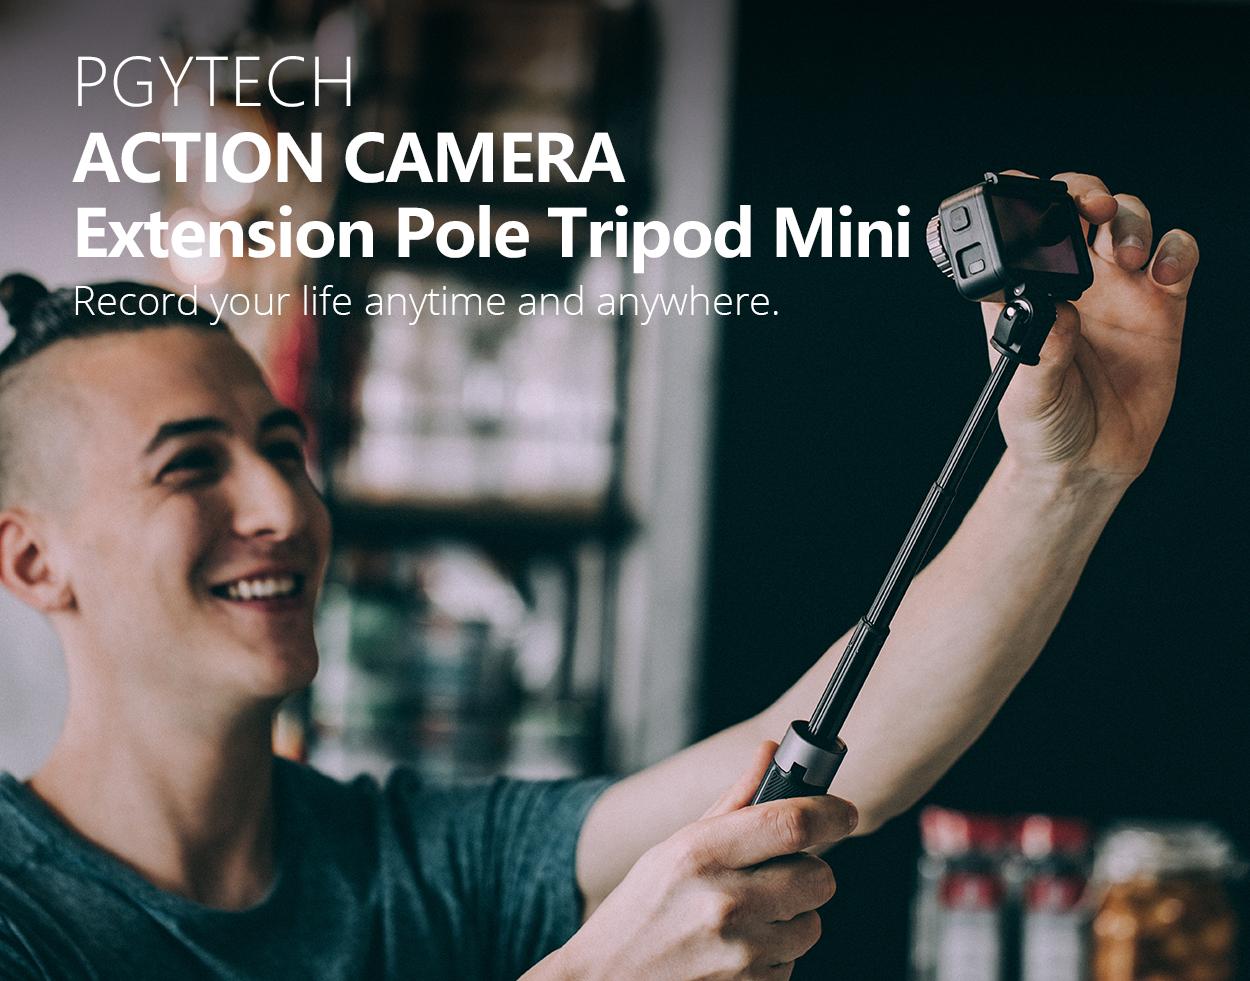 pgy-extension-pole-tripod1.jpg